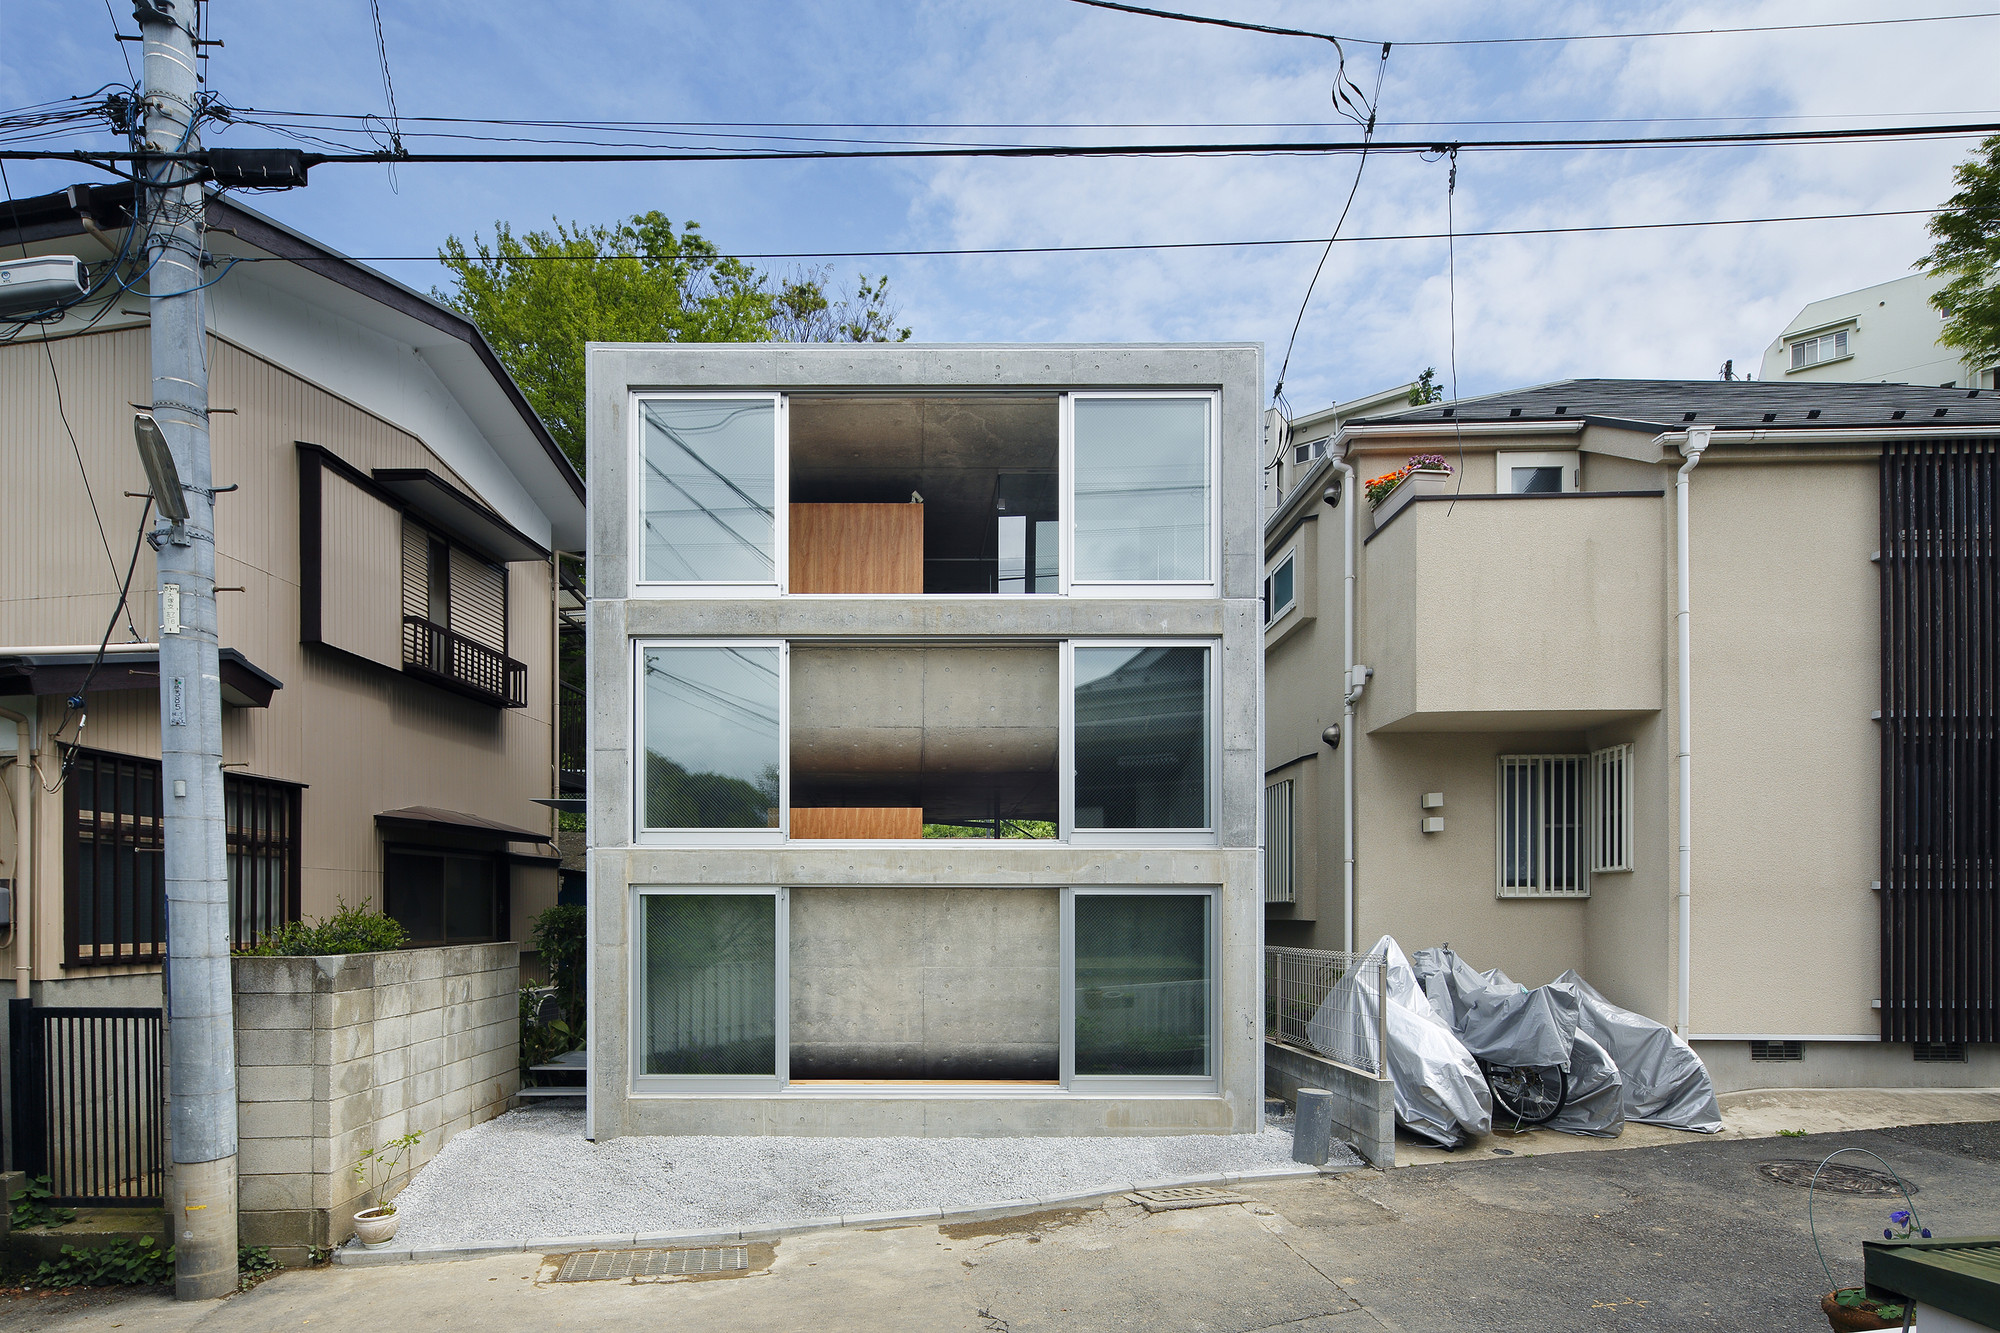 gallery of house in byoubugaura takeshi hosaka 5. Black Bedroom Furniture Sets. Home Design Ideas